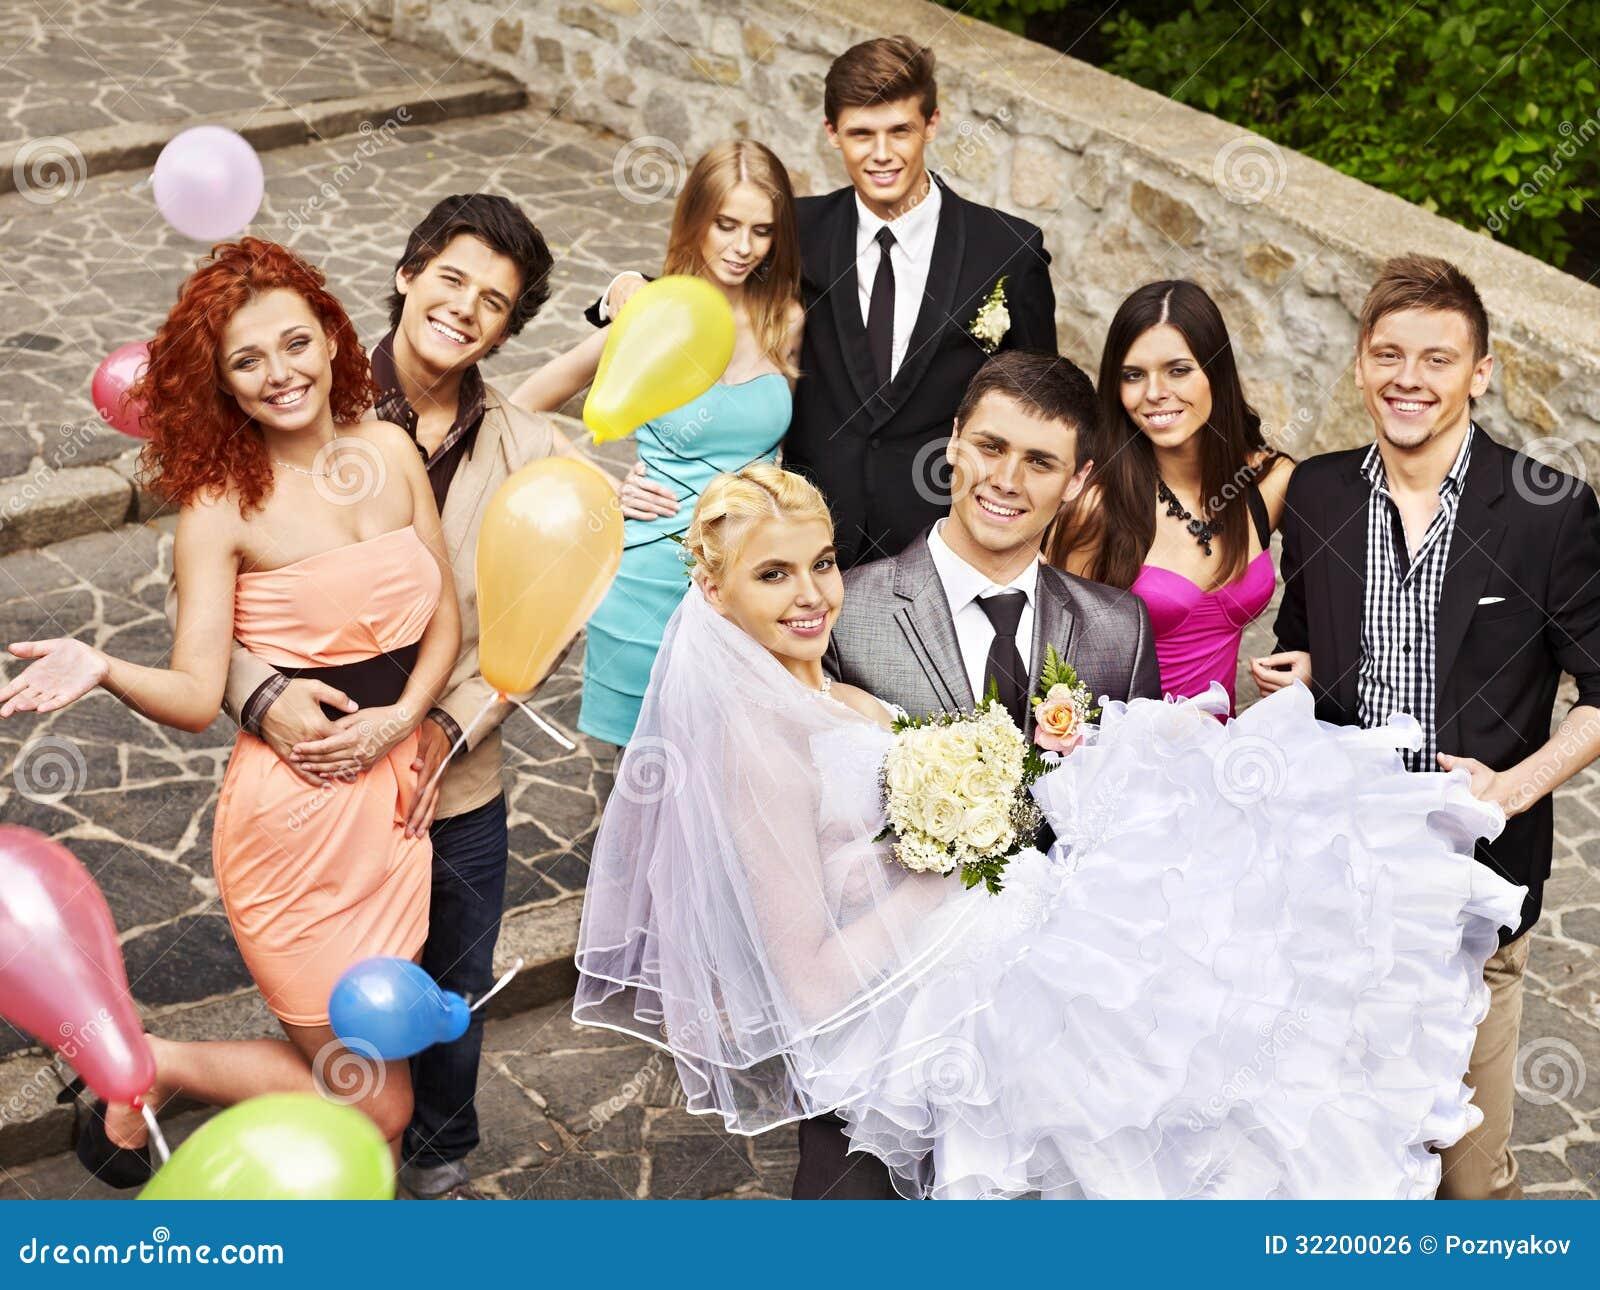 Jeremy roloff wedding dress tori roloff celebrates pregnant sisterinlaw peoplecom junglespirit Gallery